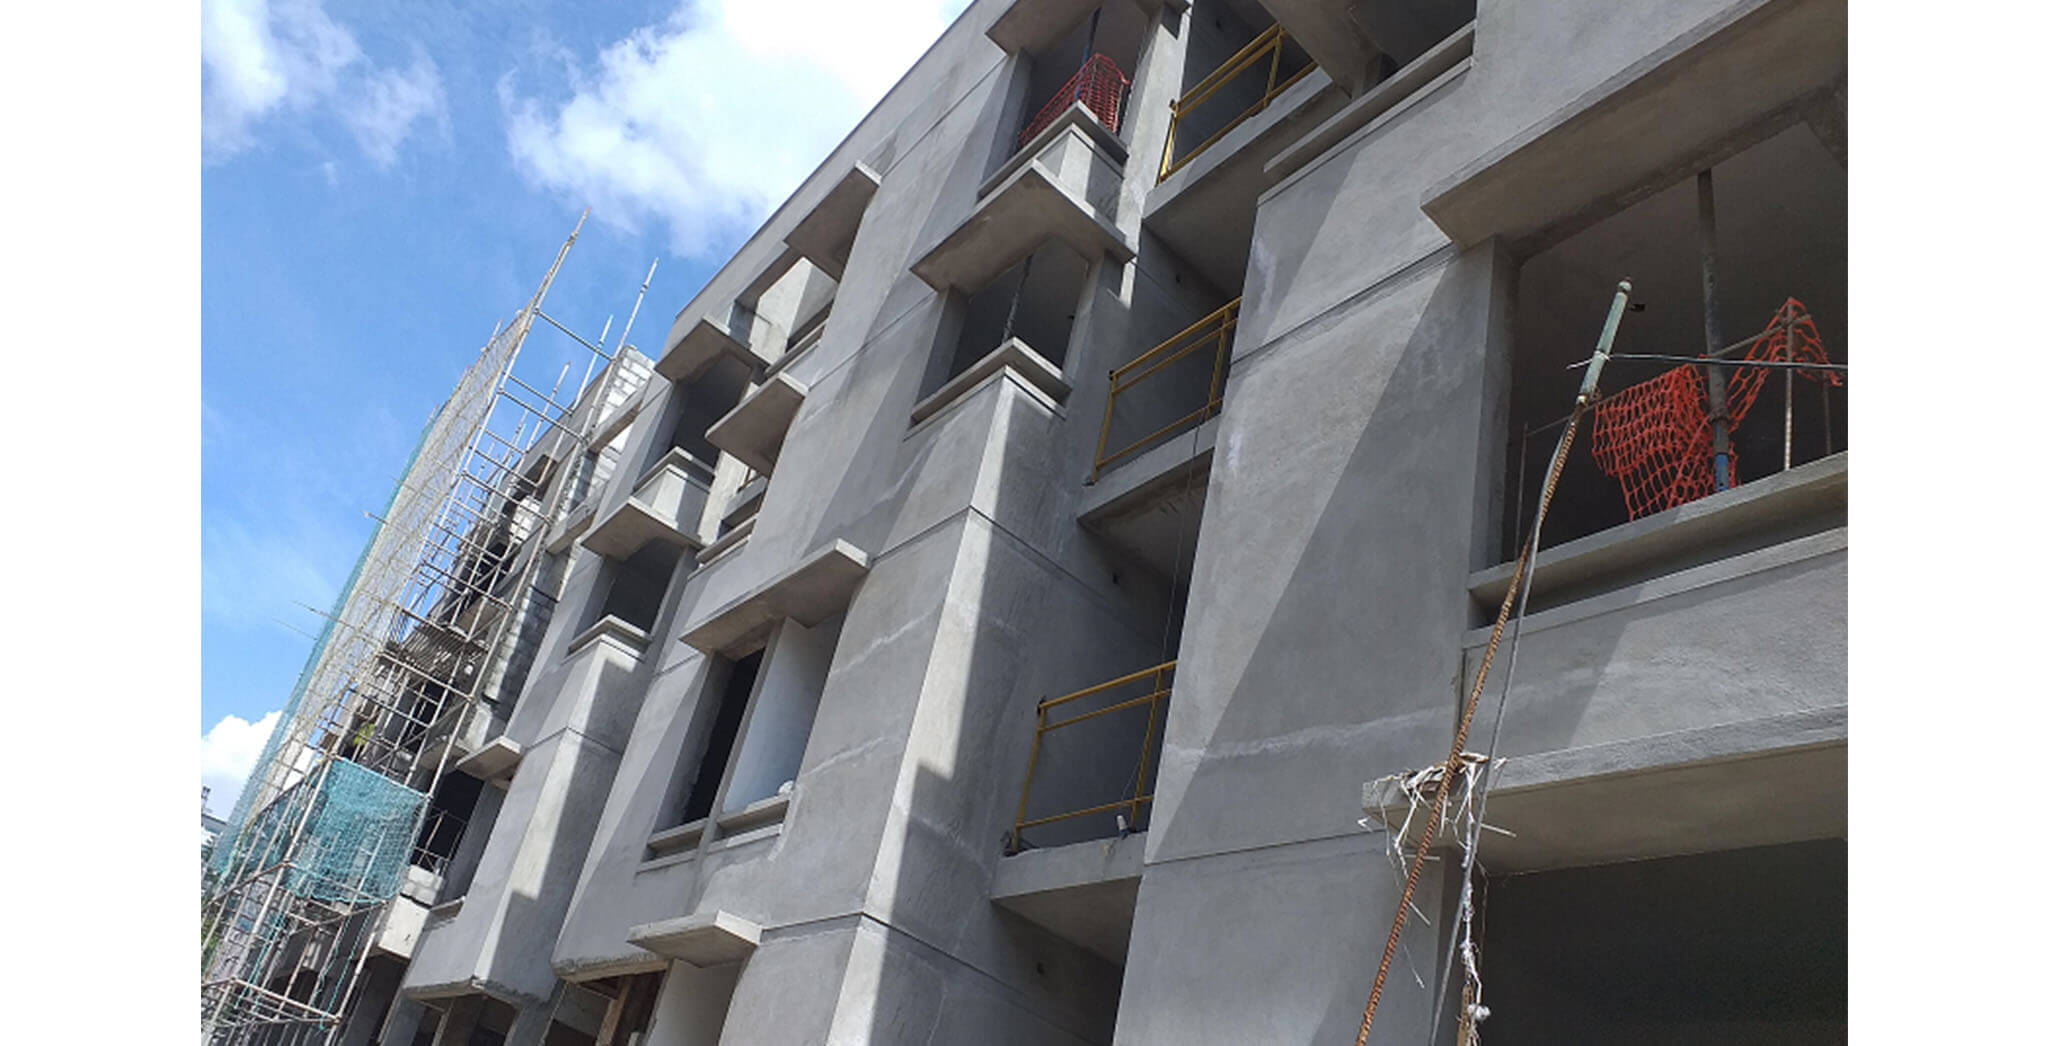 Jun 2021 - Block A: Northside external plastering works completed